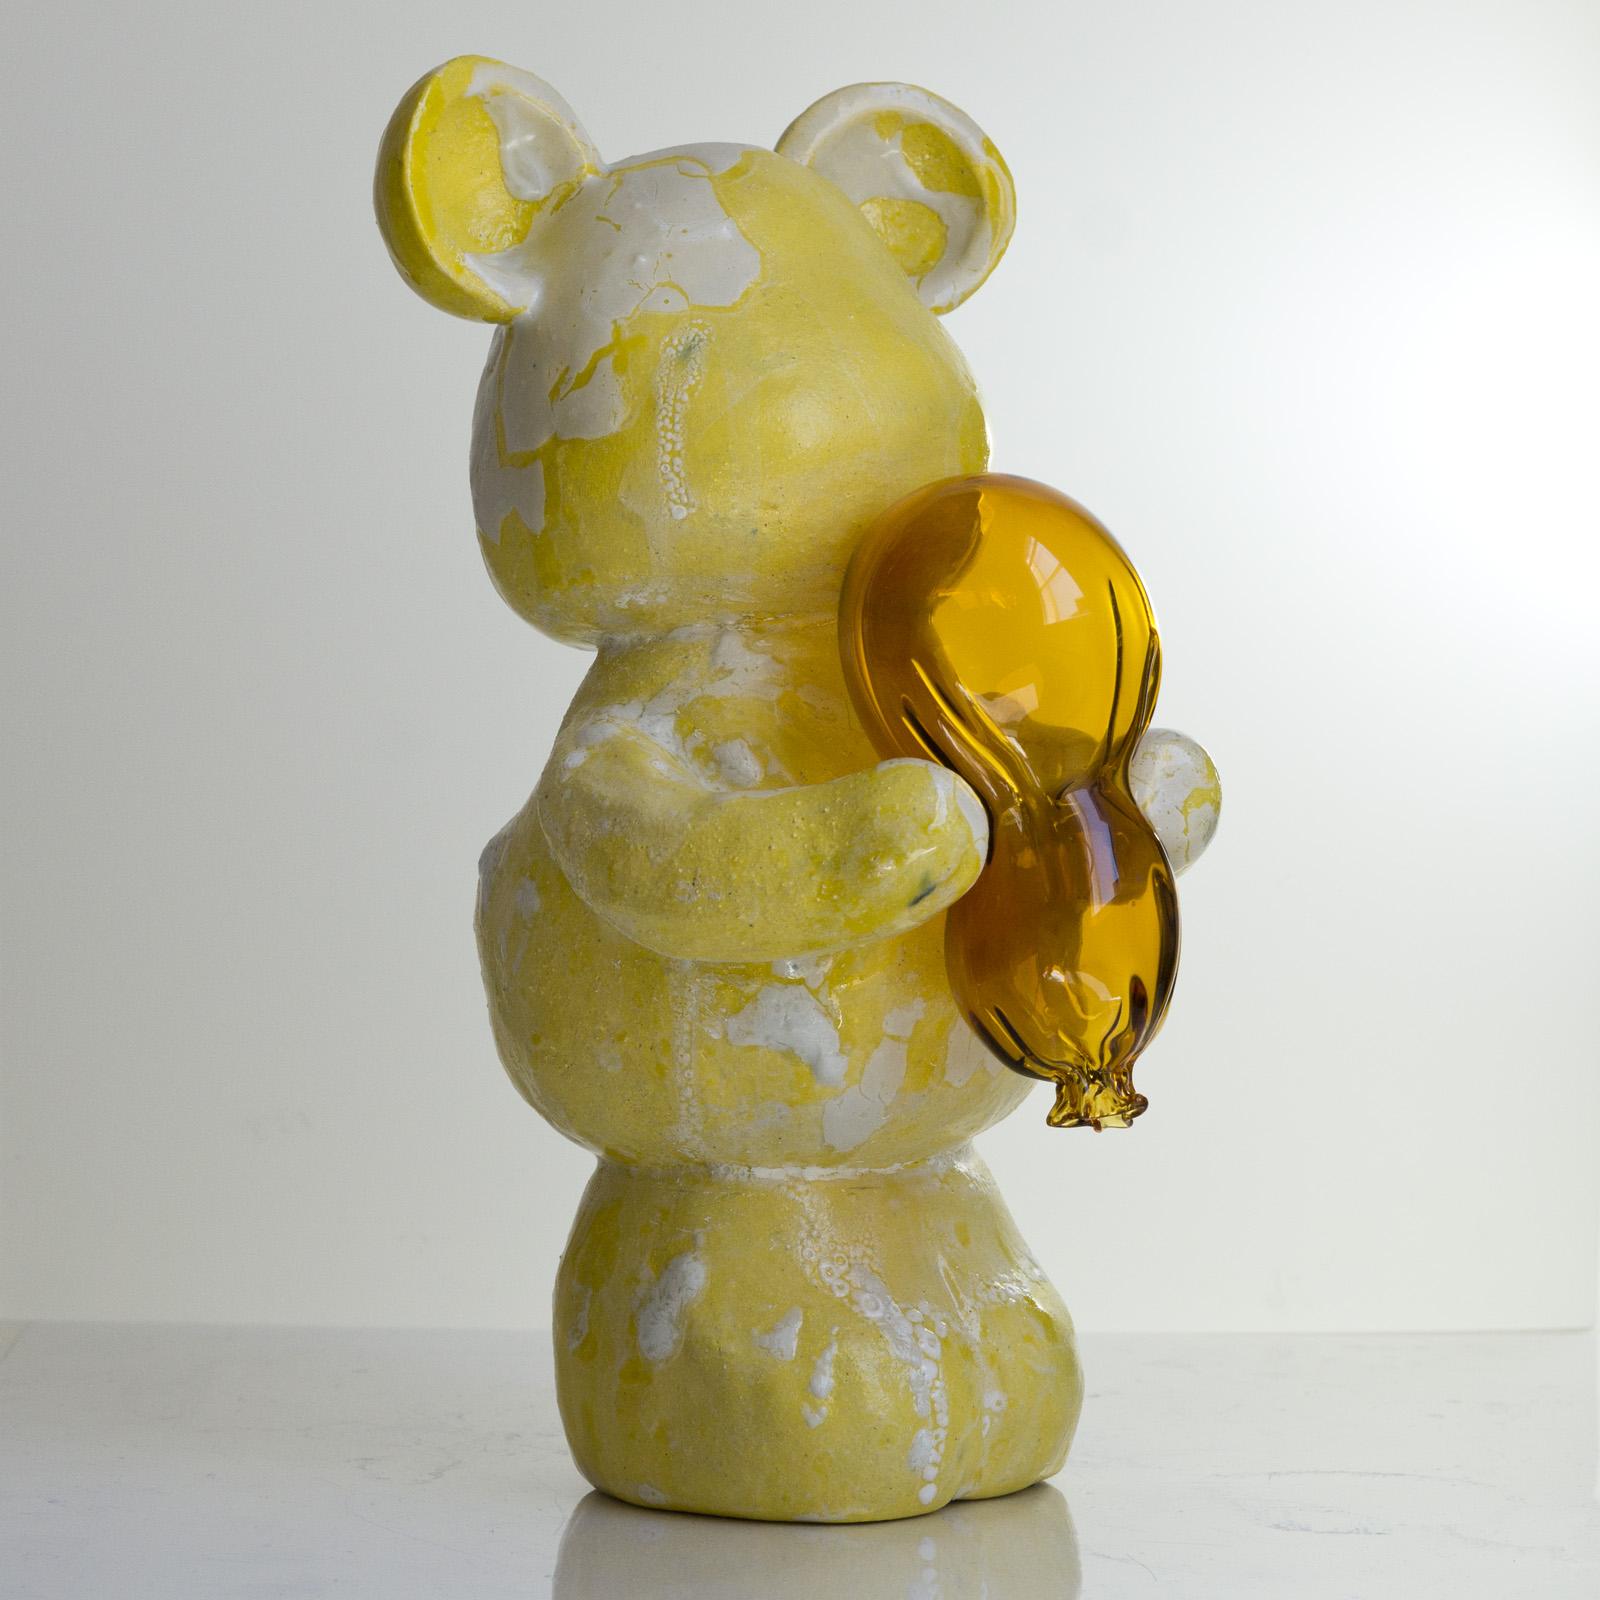 The Hysterical Teddy